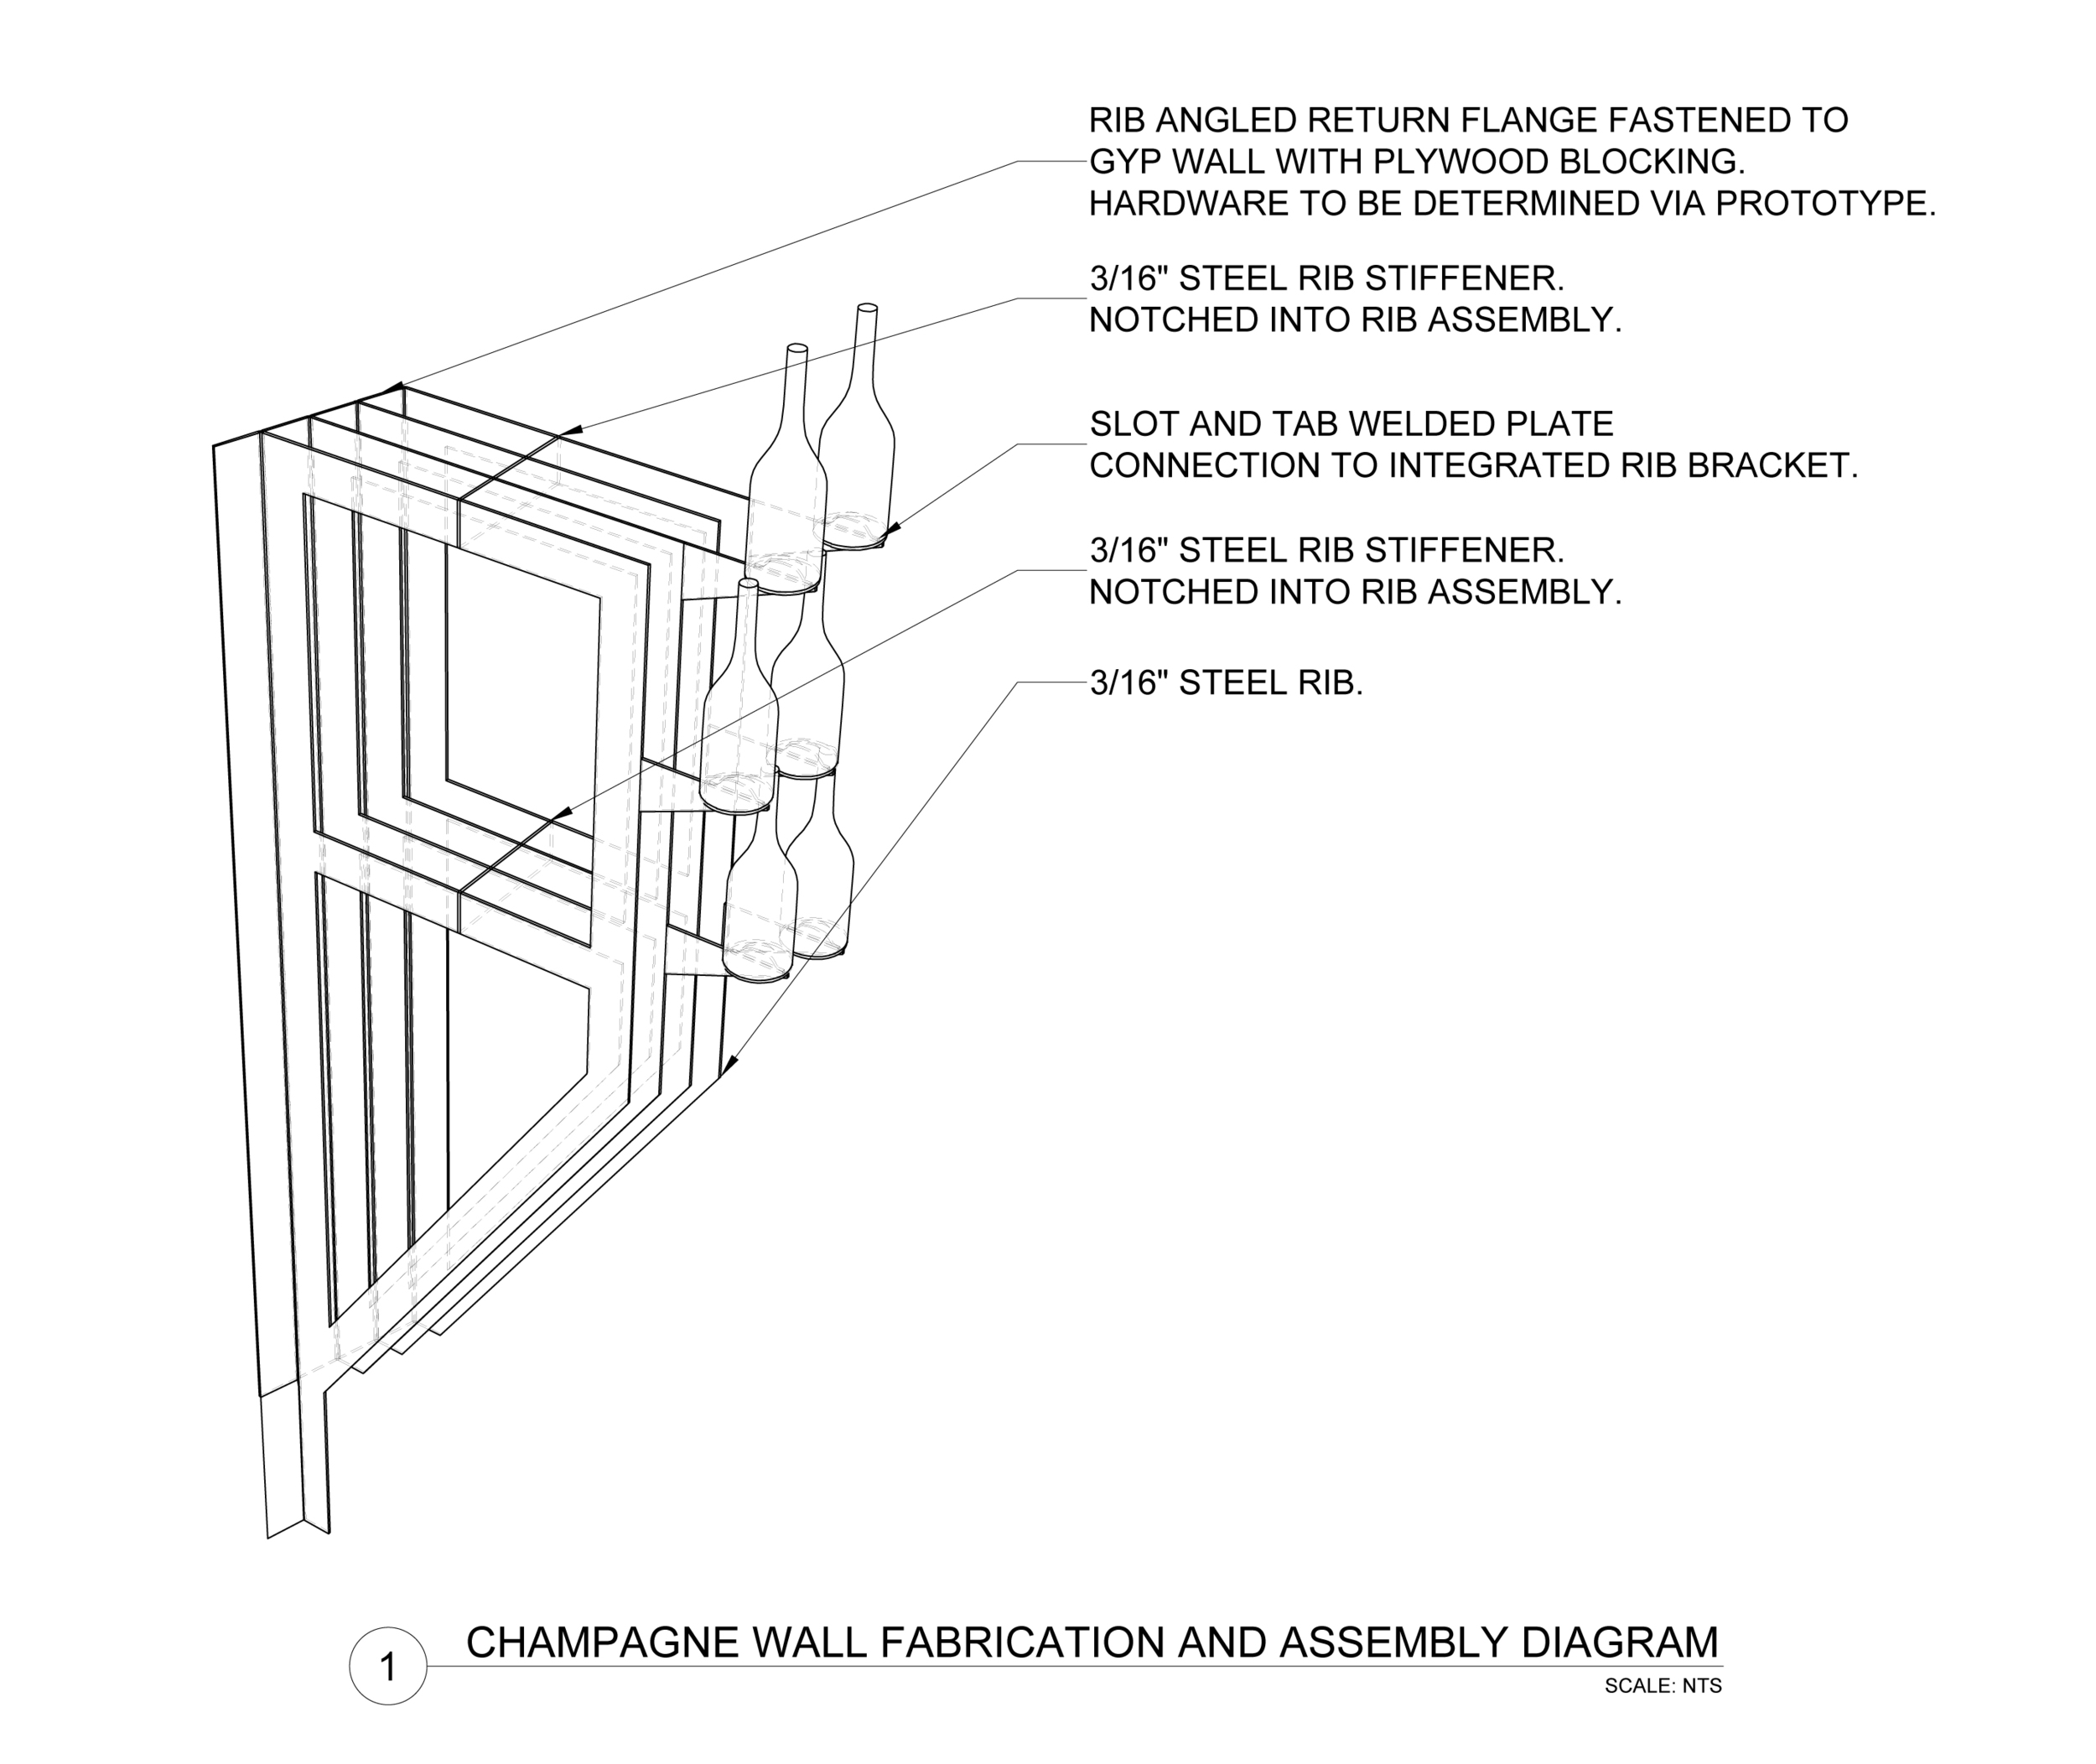 120815_SHOP_CHAMPAGNE WALL_FAB DIAGRAM.jpg